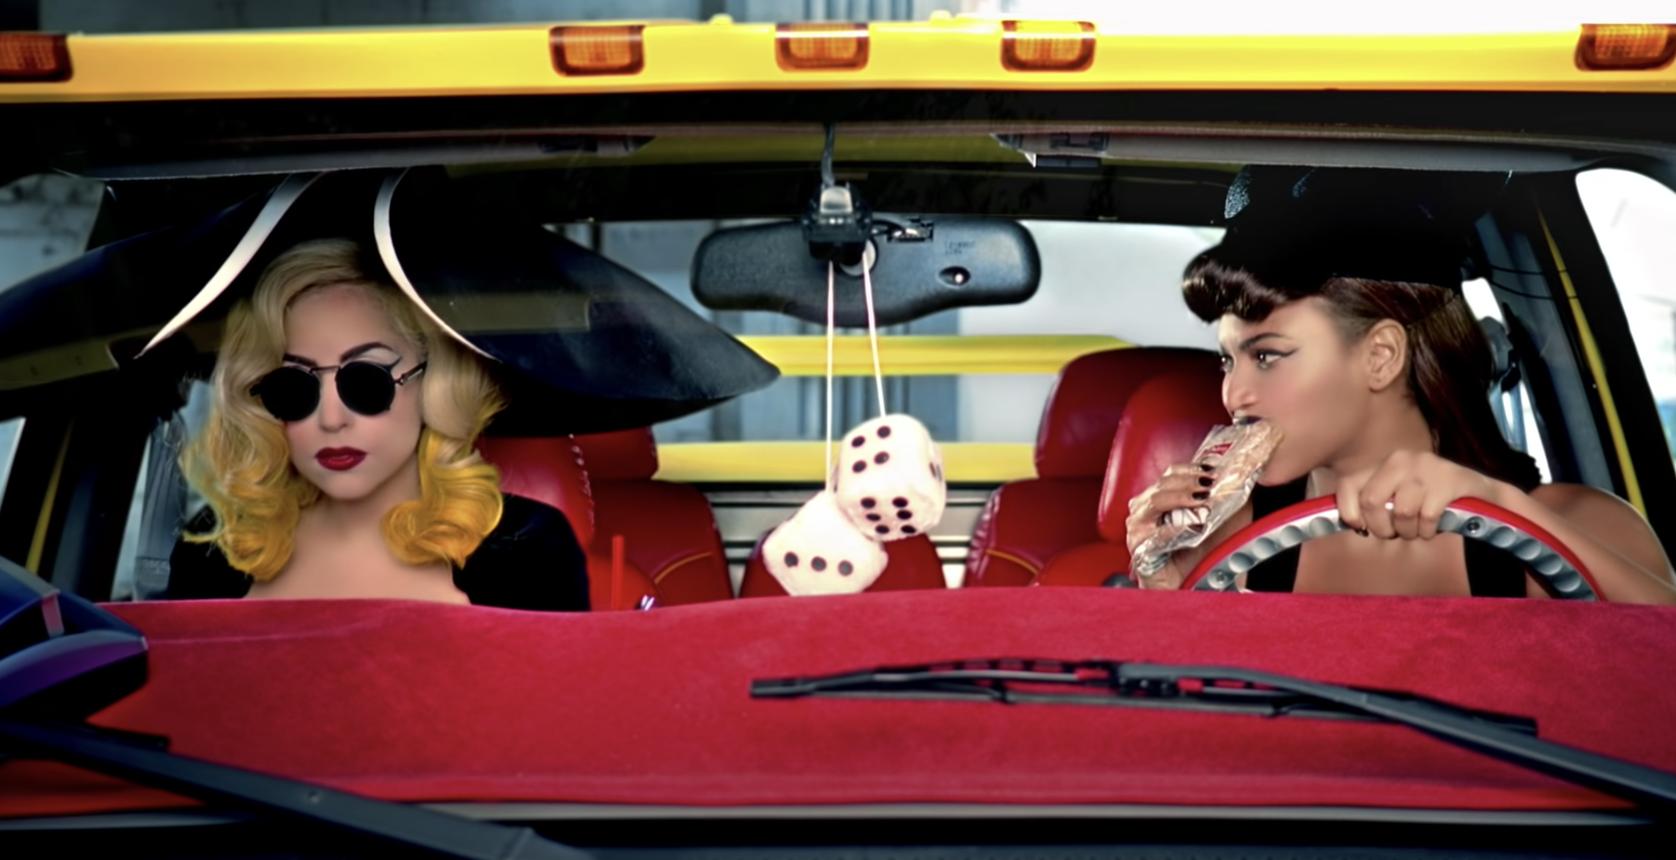 Beyonce eating a sandwich as she picks up Lady Gaga